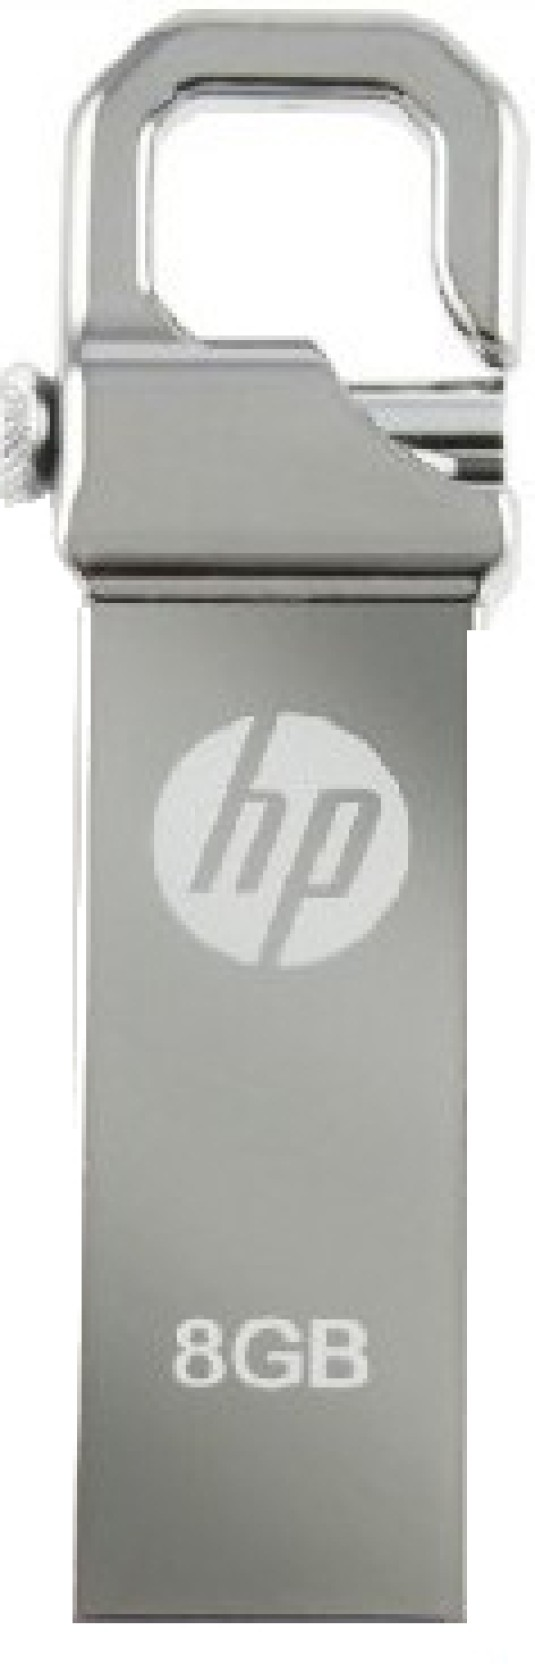 Hp V 250 W 8 Gb Utility Pendrive Flasdisk 8gb V250w Home